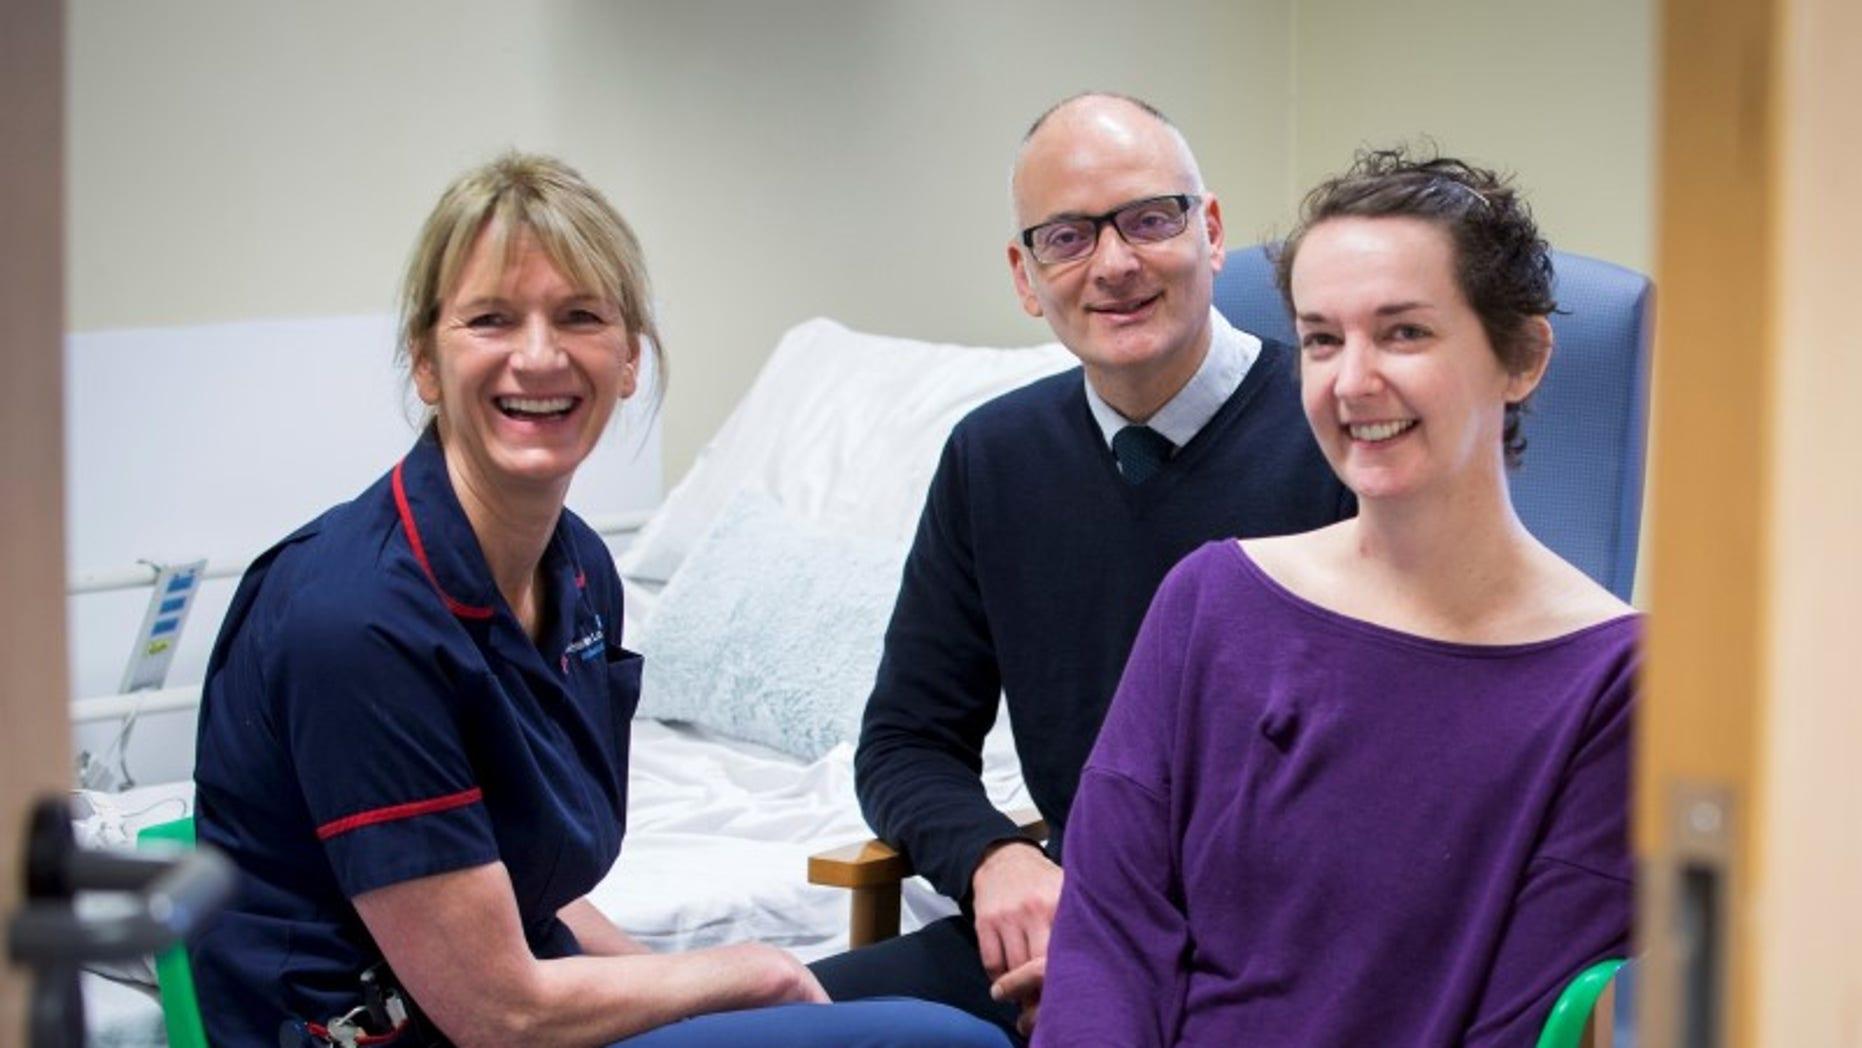 Pauline Cafferkey (R) smiles alongside Doctor Michael Jacobs and Senior Matron Breda Athan at the Royal Free Hospital in London, November 11, 2015. REUTERS/Royal Free Hospital/Handout